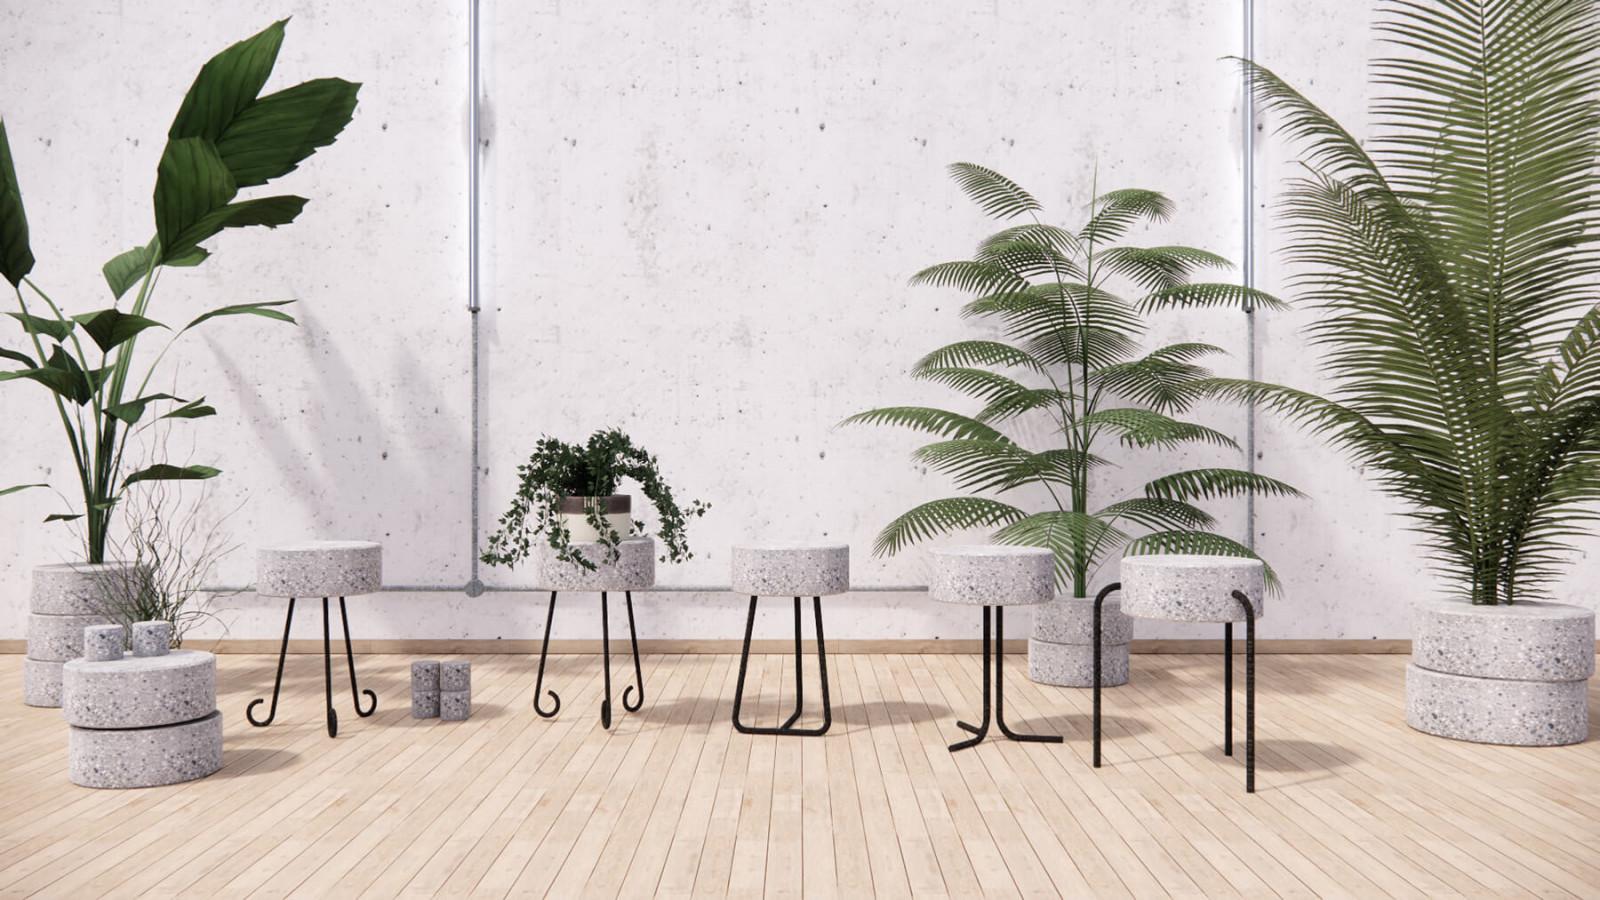 graam-tabouret-beton-mobilier-reemploi